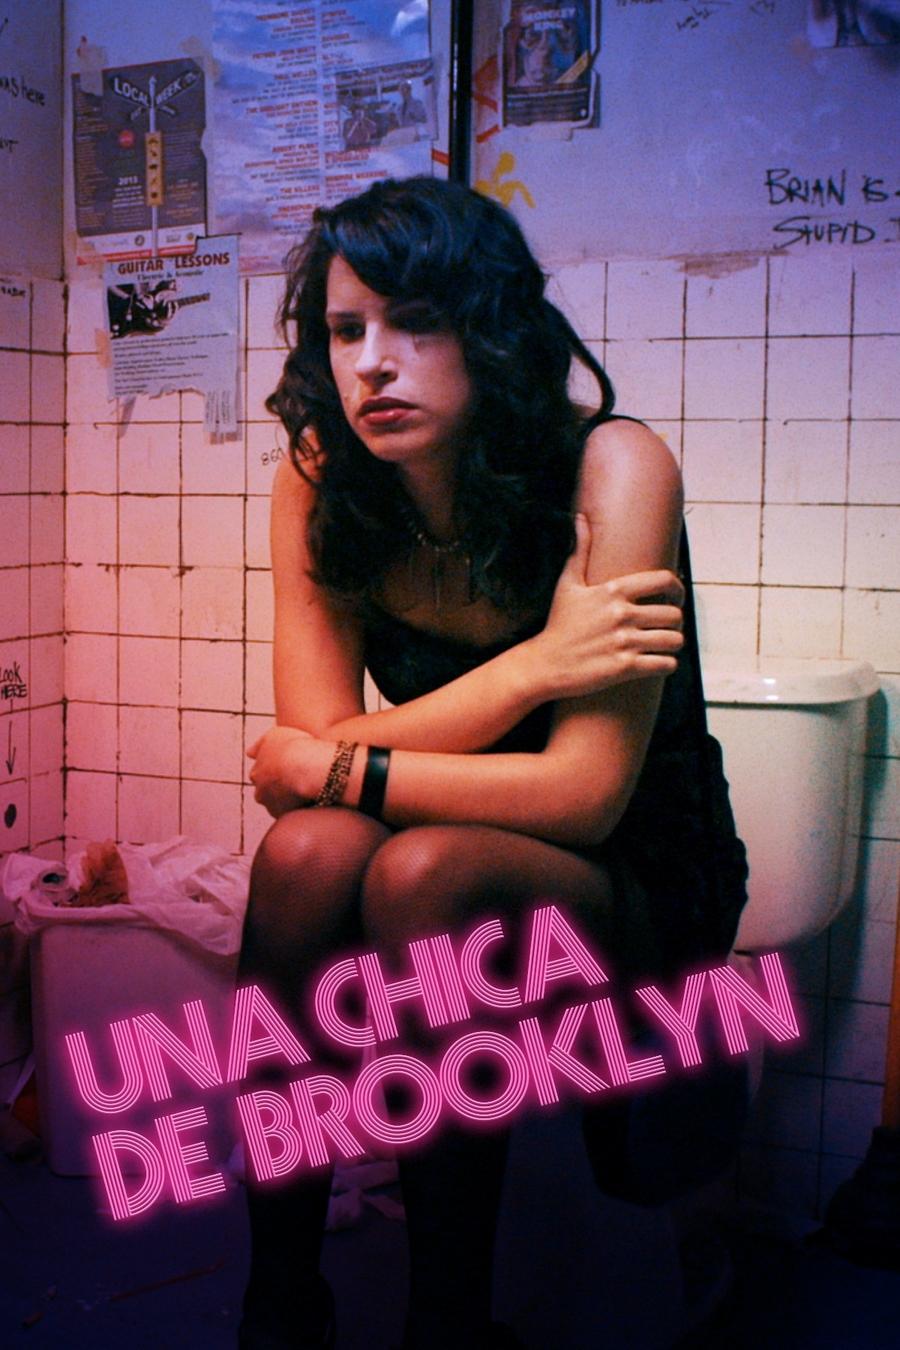 Una noia de Brooklyn